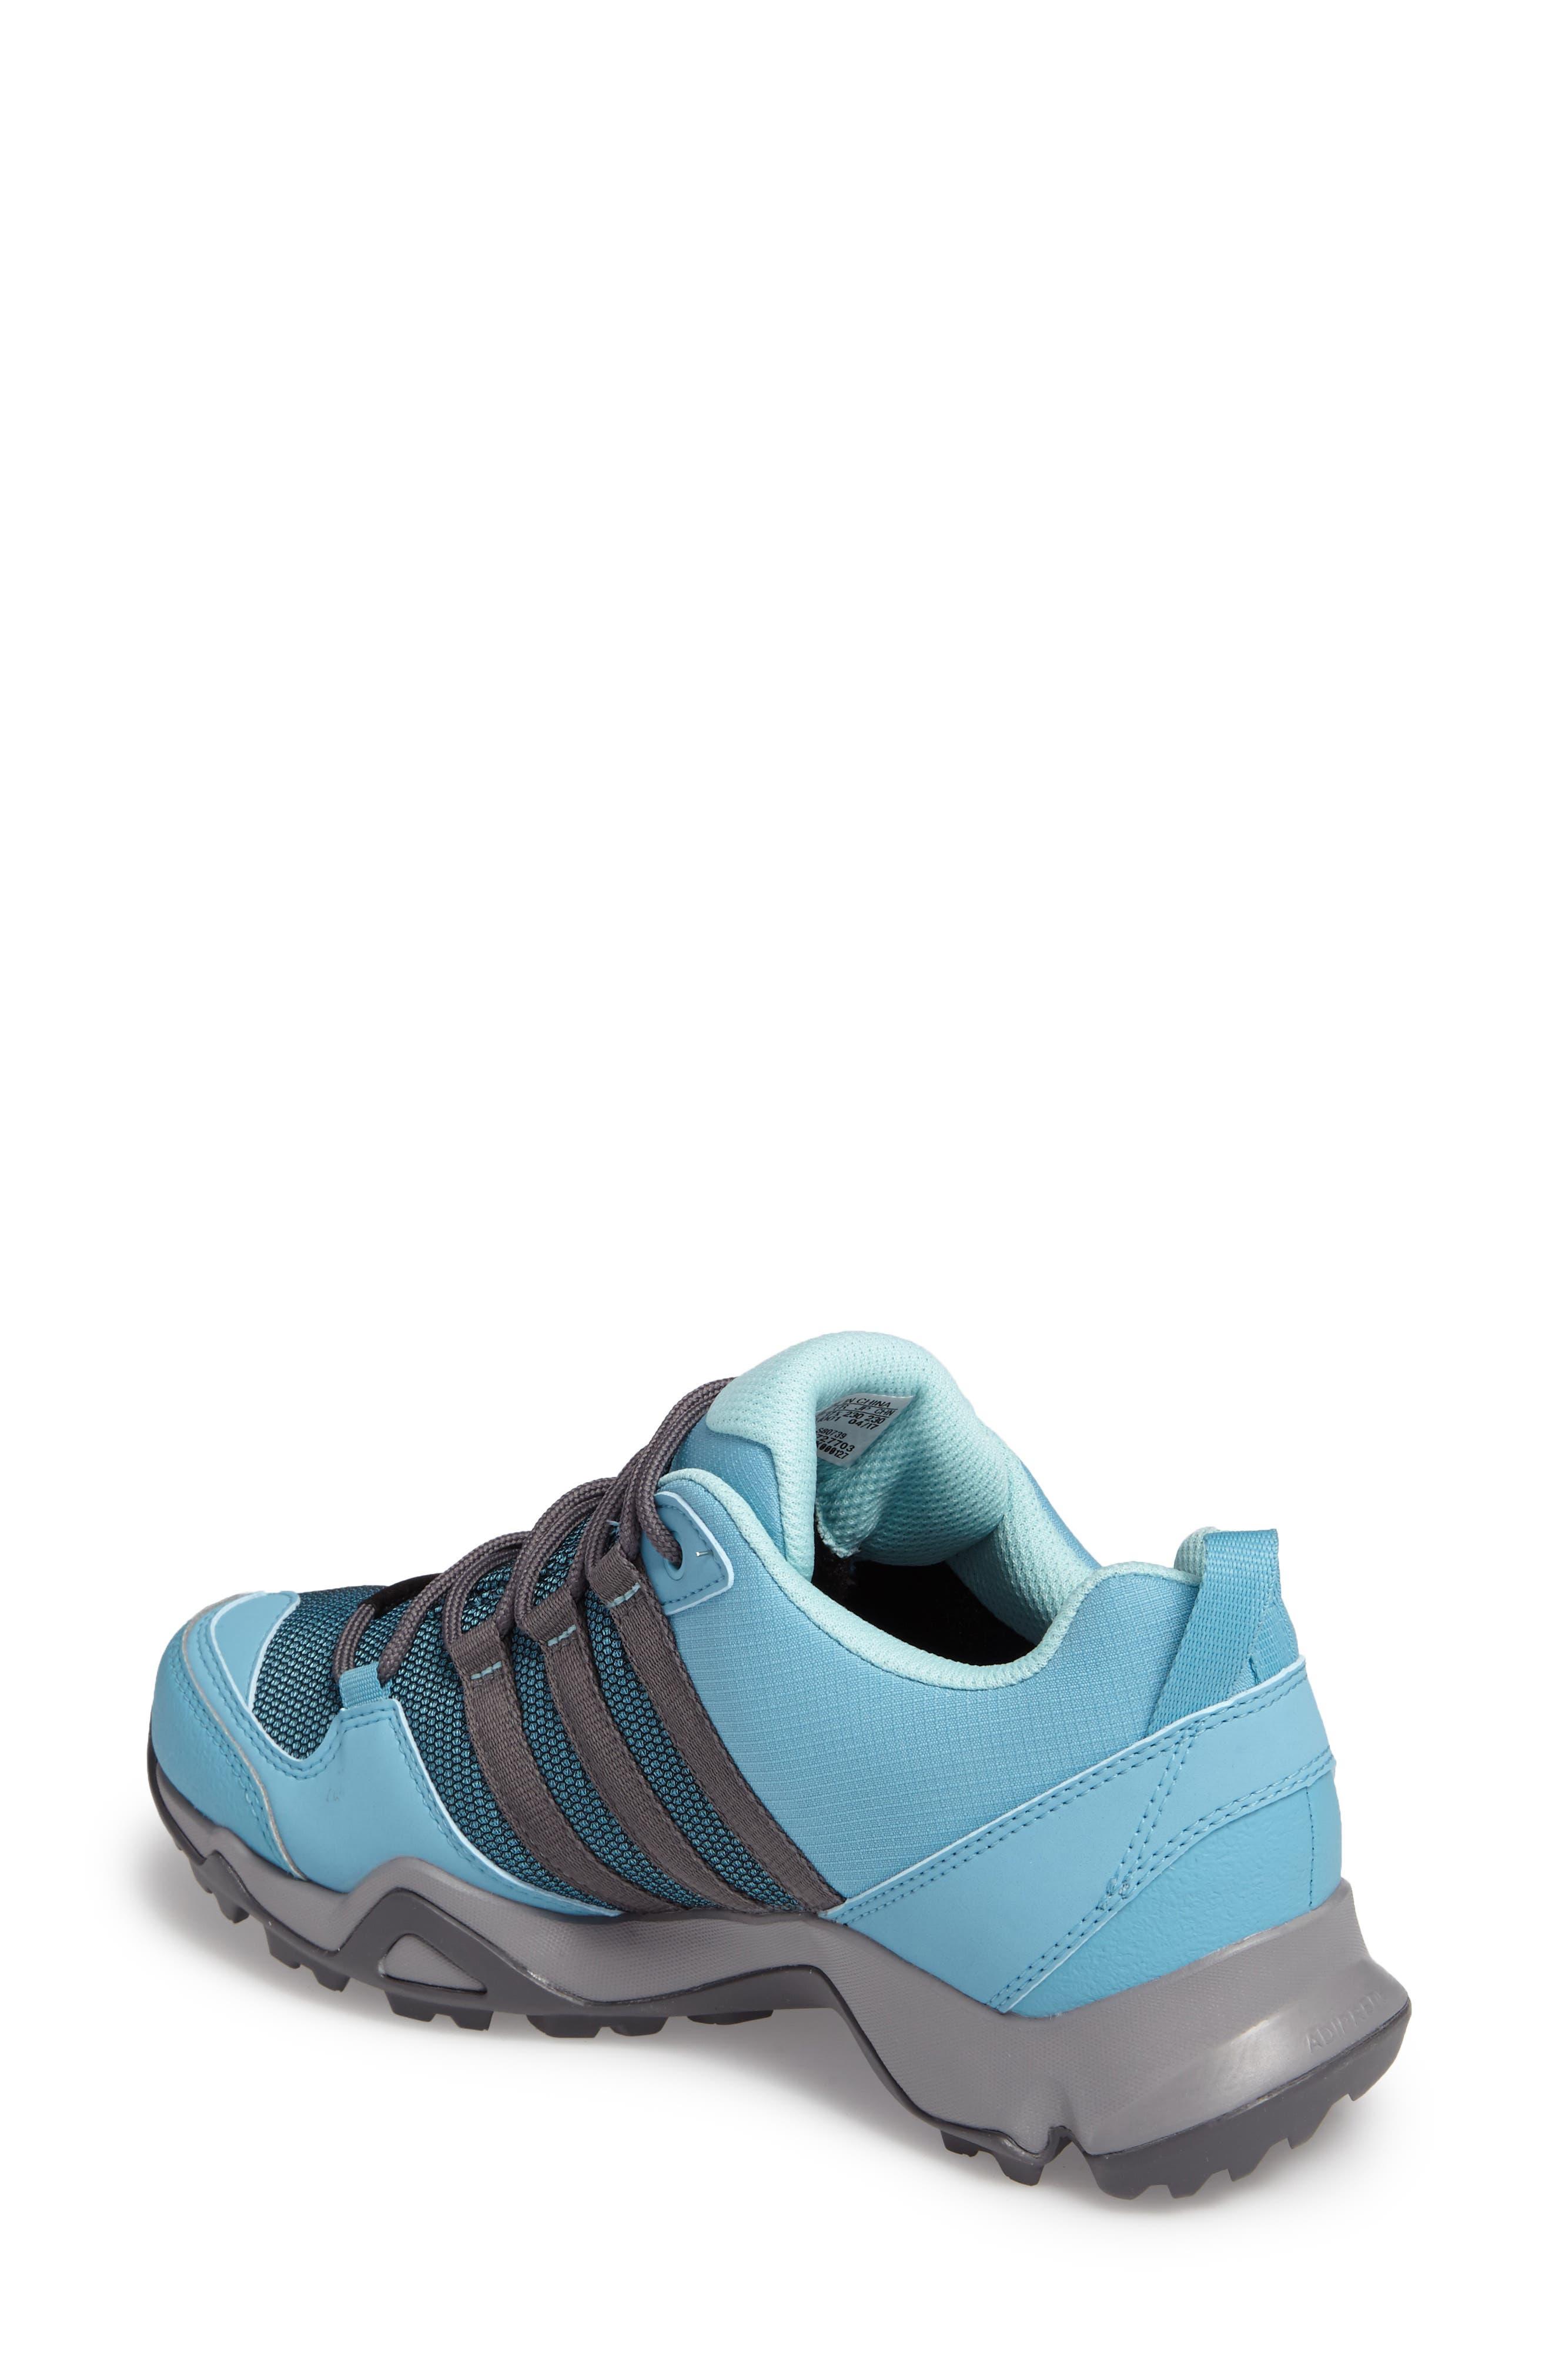 'AX2' Waterproof Hiking Shoe,                             Alternate thumbnail 2, color,                             400